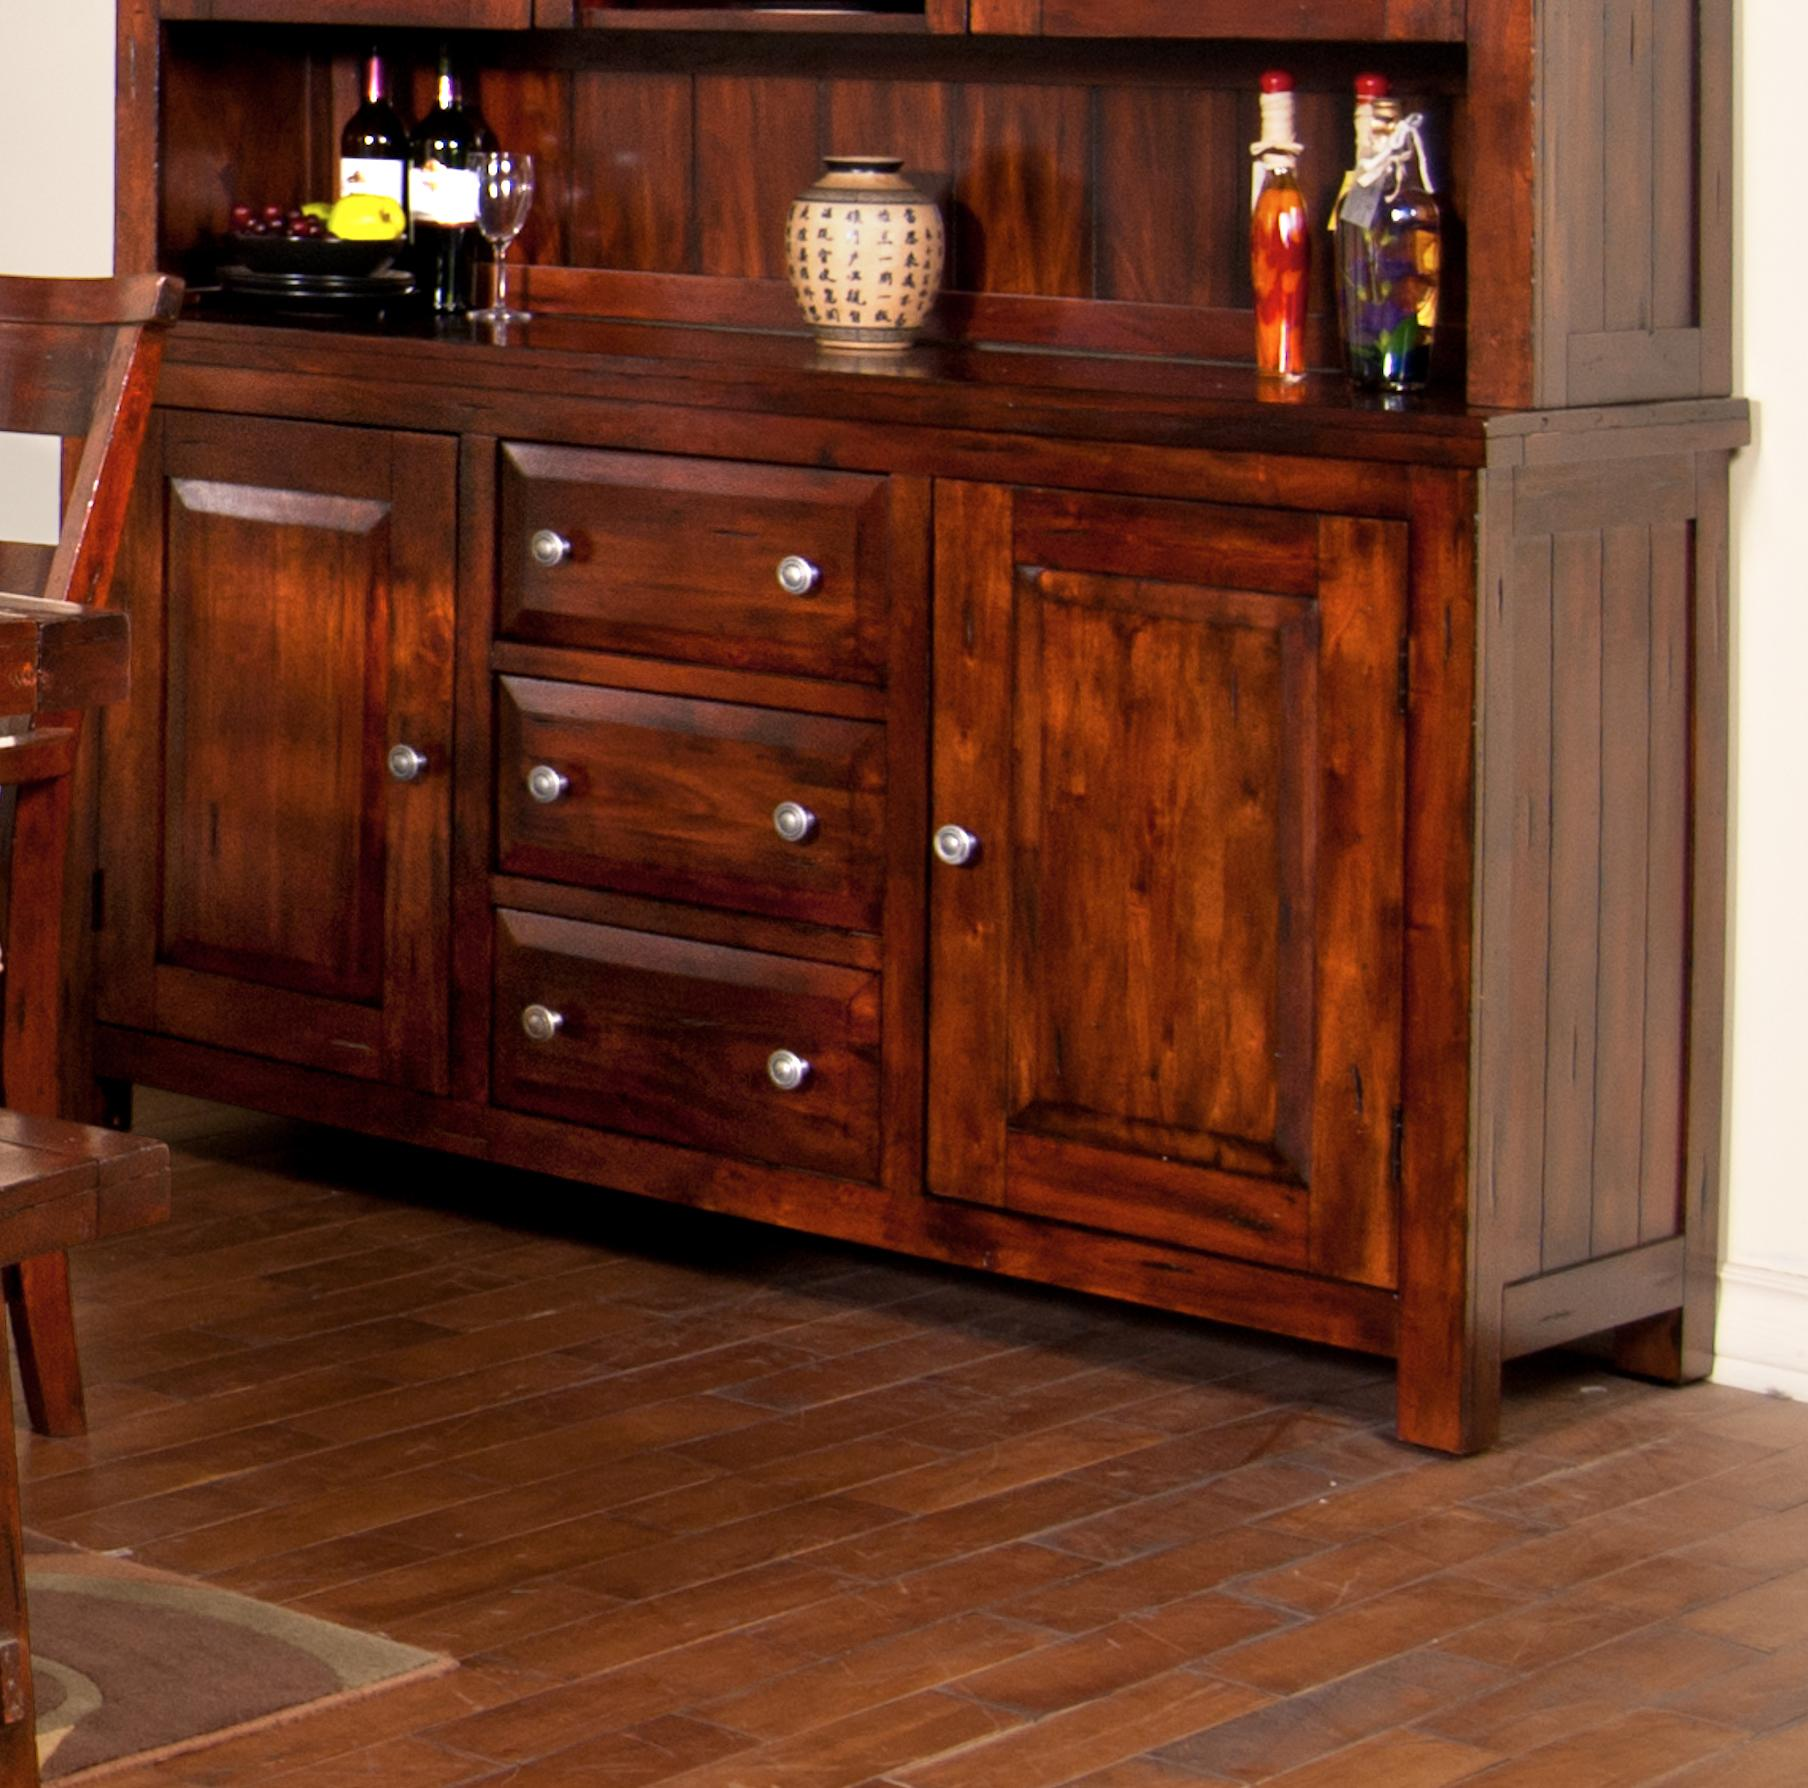 Sunny designs vineyard 2428rm b mahogany buffet john v schultz furniture buffets for Sunny designs bedroom furniture